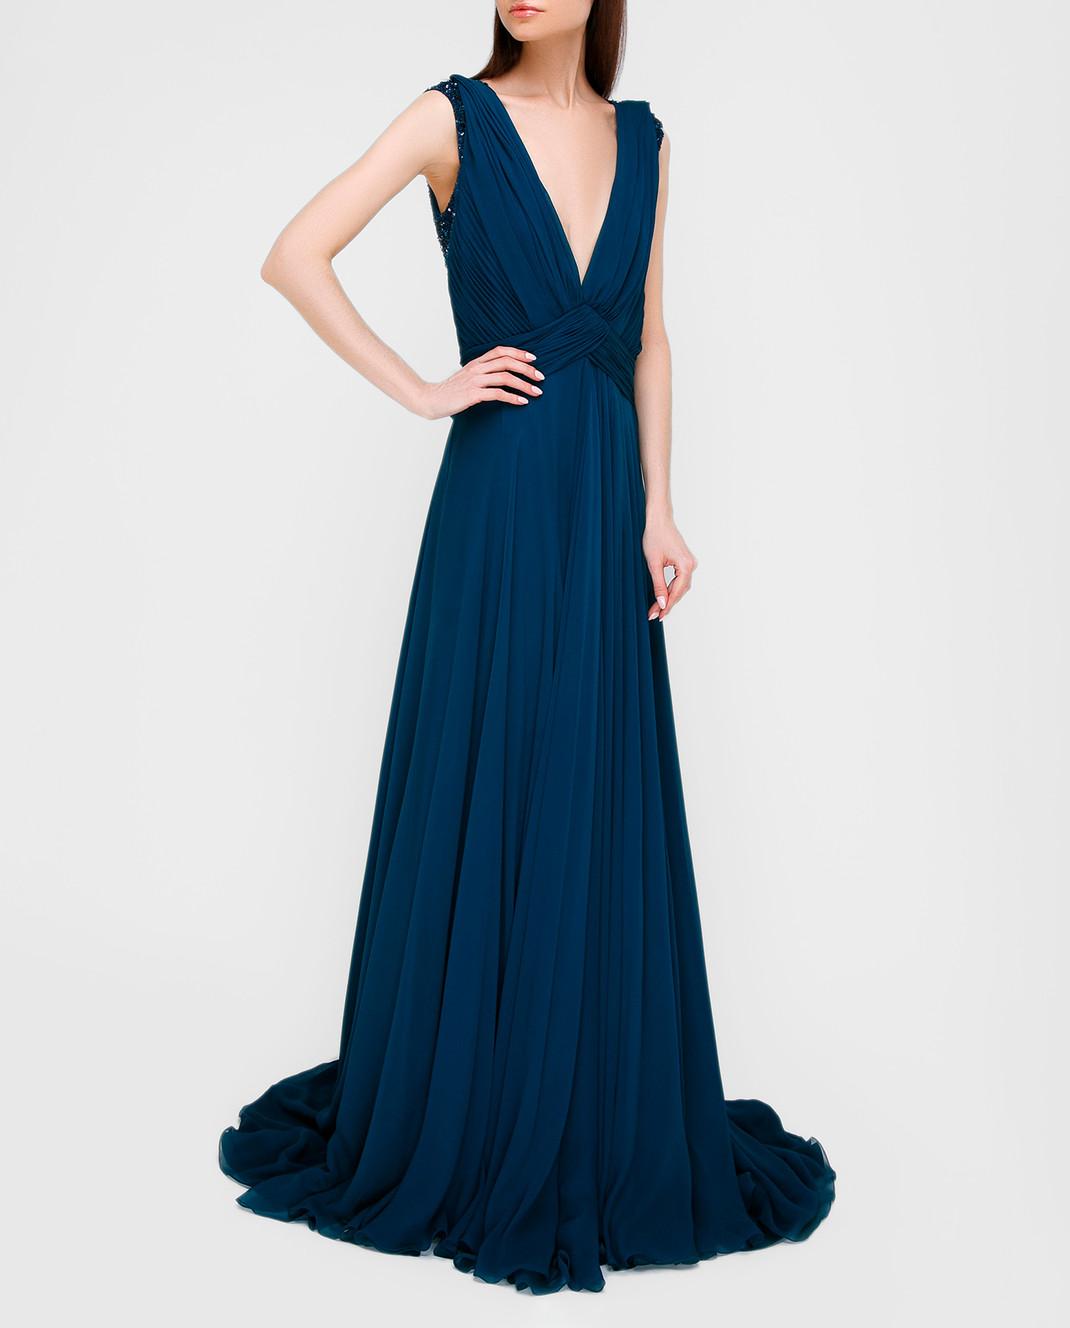 Темно-синее платье из шелка со шлейфом Jenny Packham ZD141L — Symbol